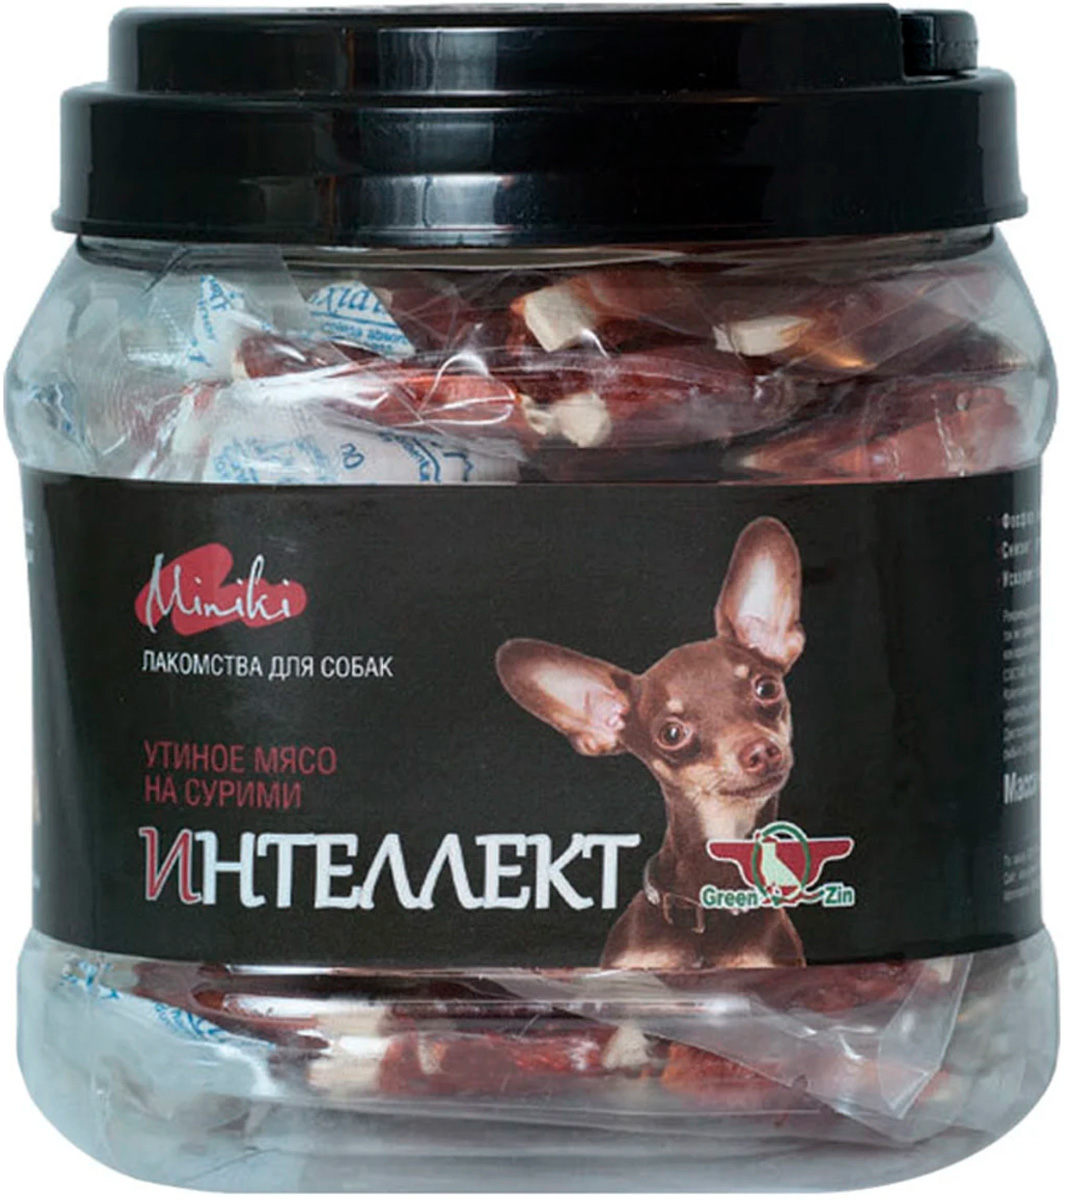 Лакомство Green Qzin Miniki Интеллект для собак маленьких пород мясо утиное сушеное на сурими 440 гр (1 шт)